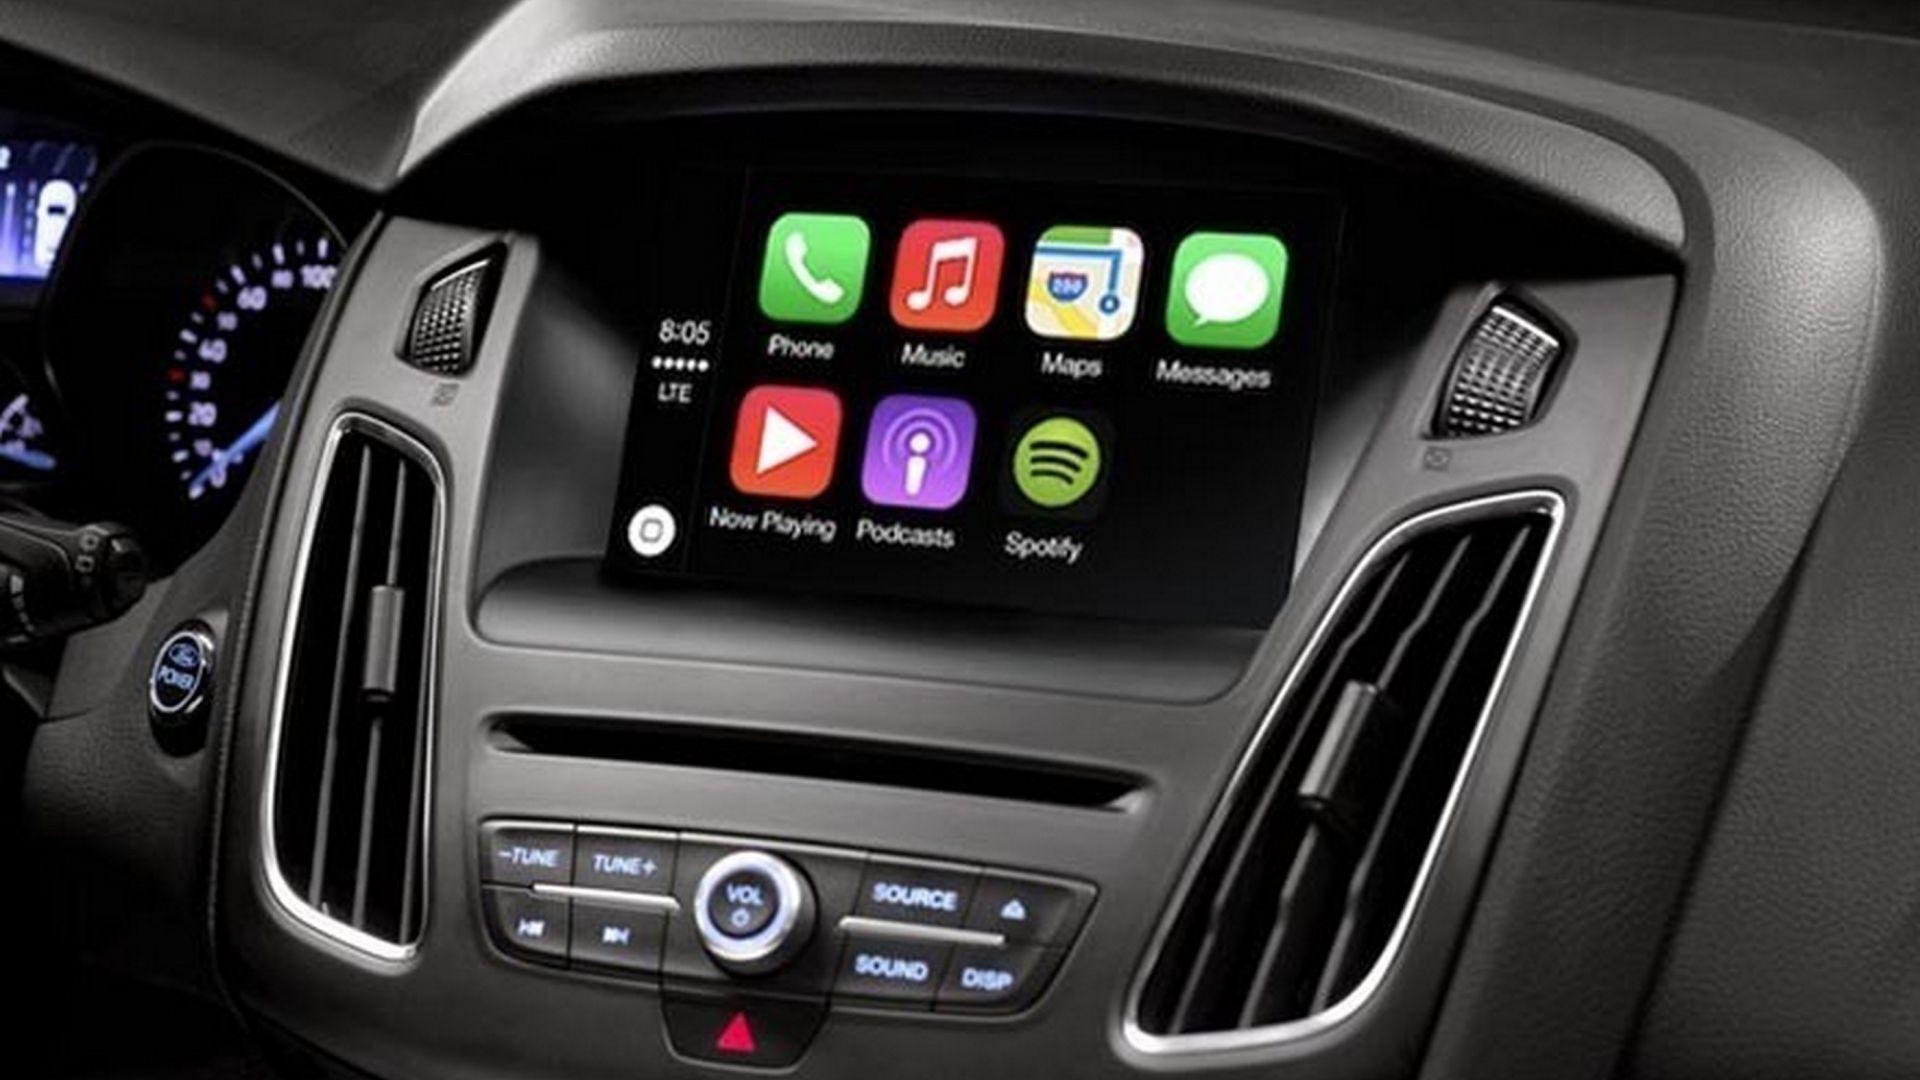 tecnologia ford dal 2017 car play e android auto su tutti i modelli motorbox. Black Bedroom Furniture Sets. Home Design Ideas